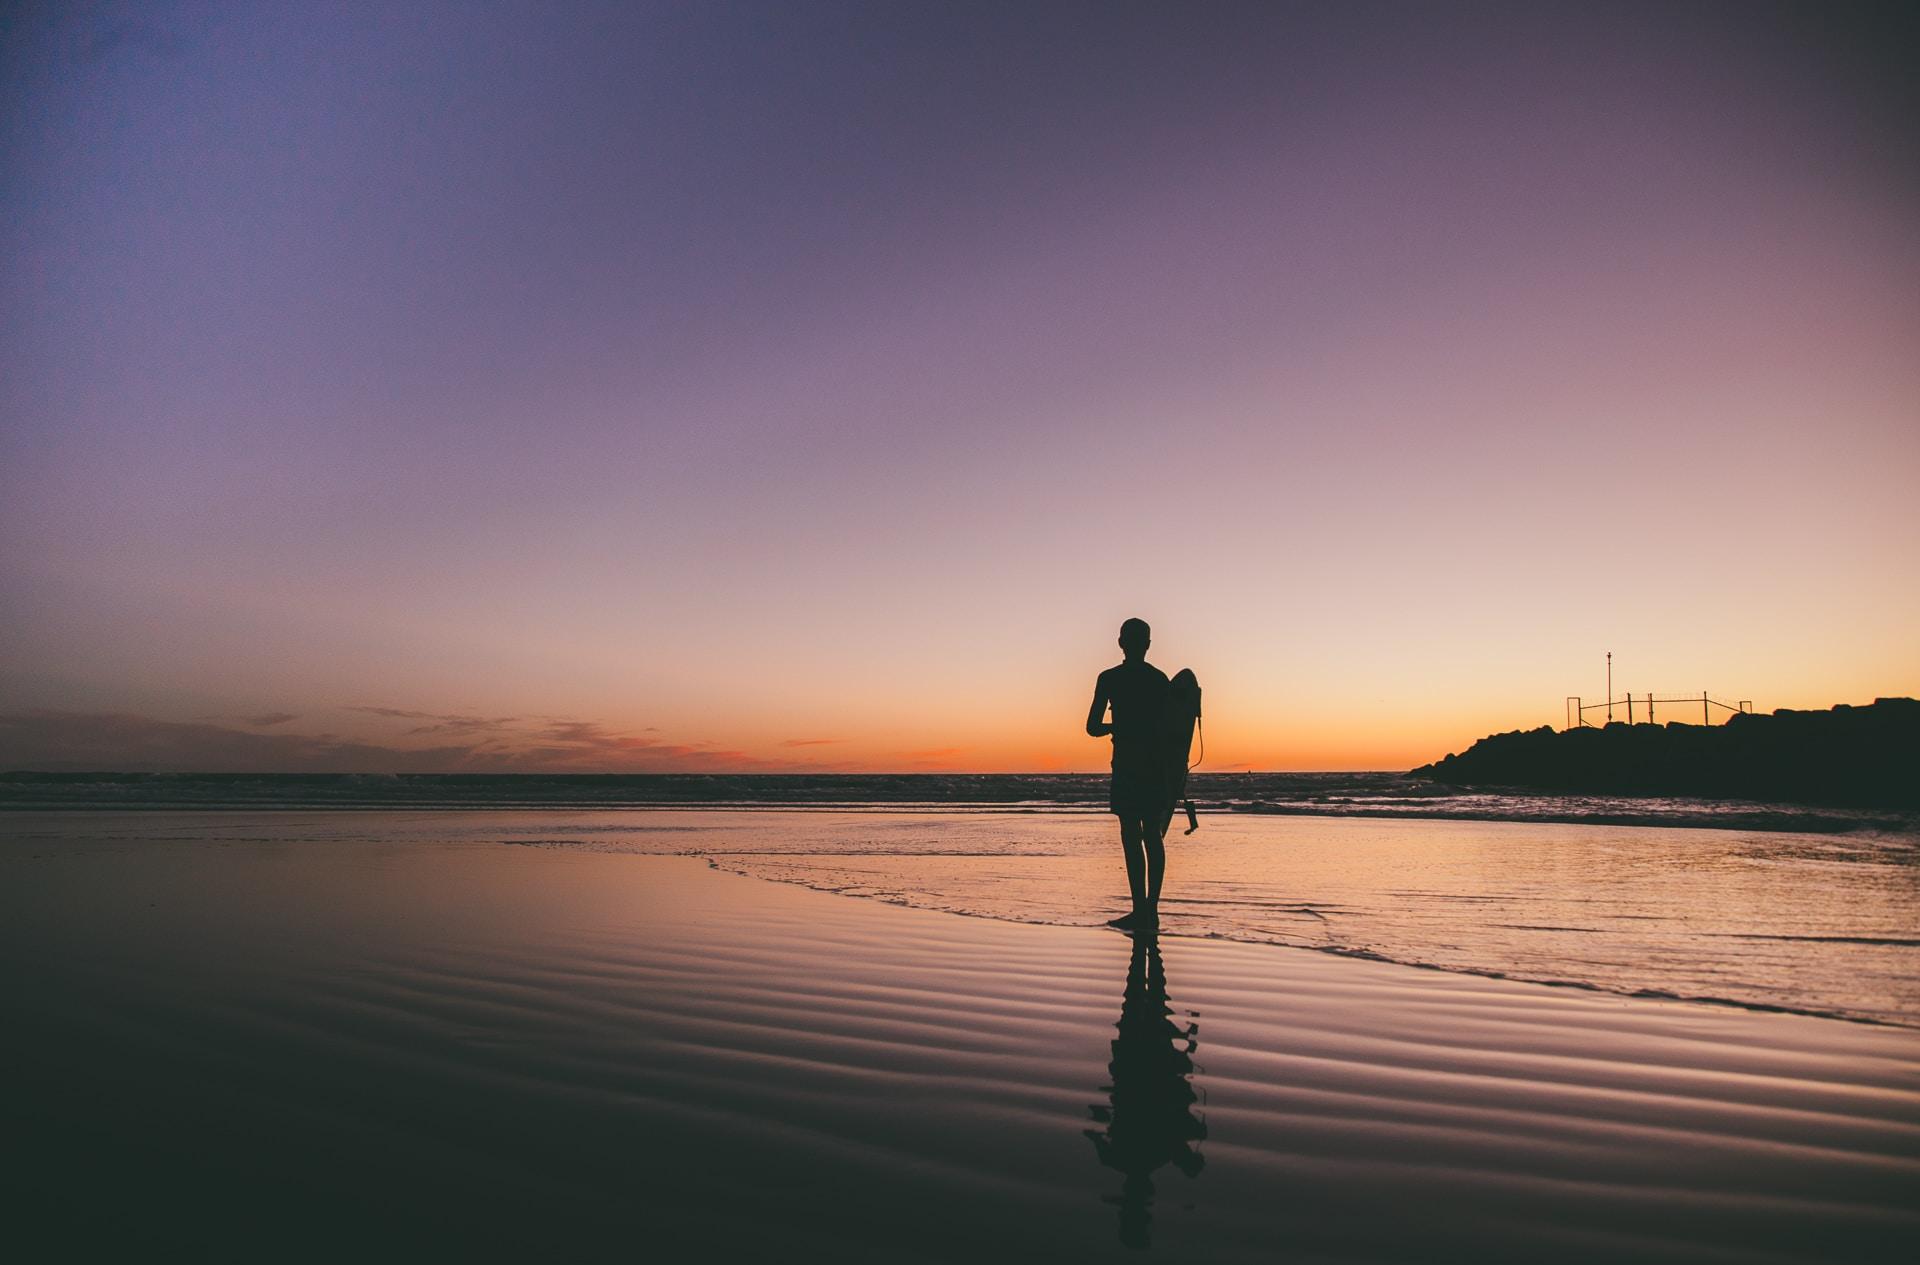 silhouette photo of man near the shore